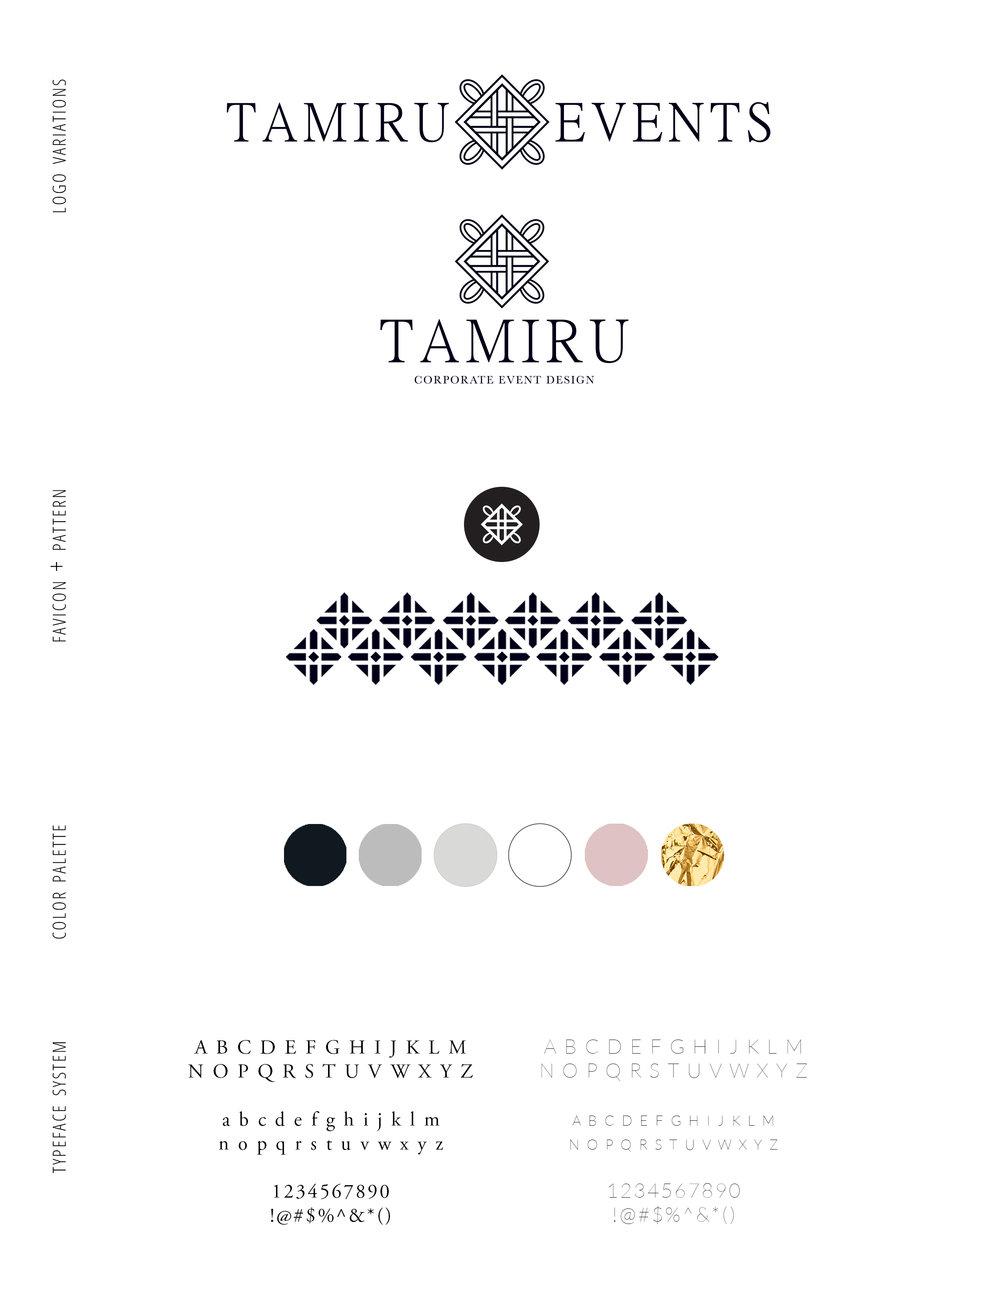 Tamiru_StyleGuide_Abbreviated.jpg